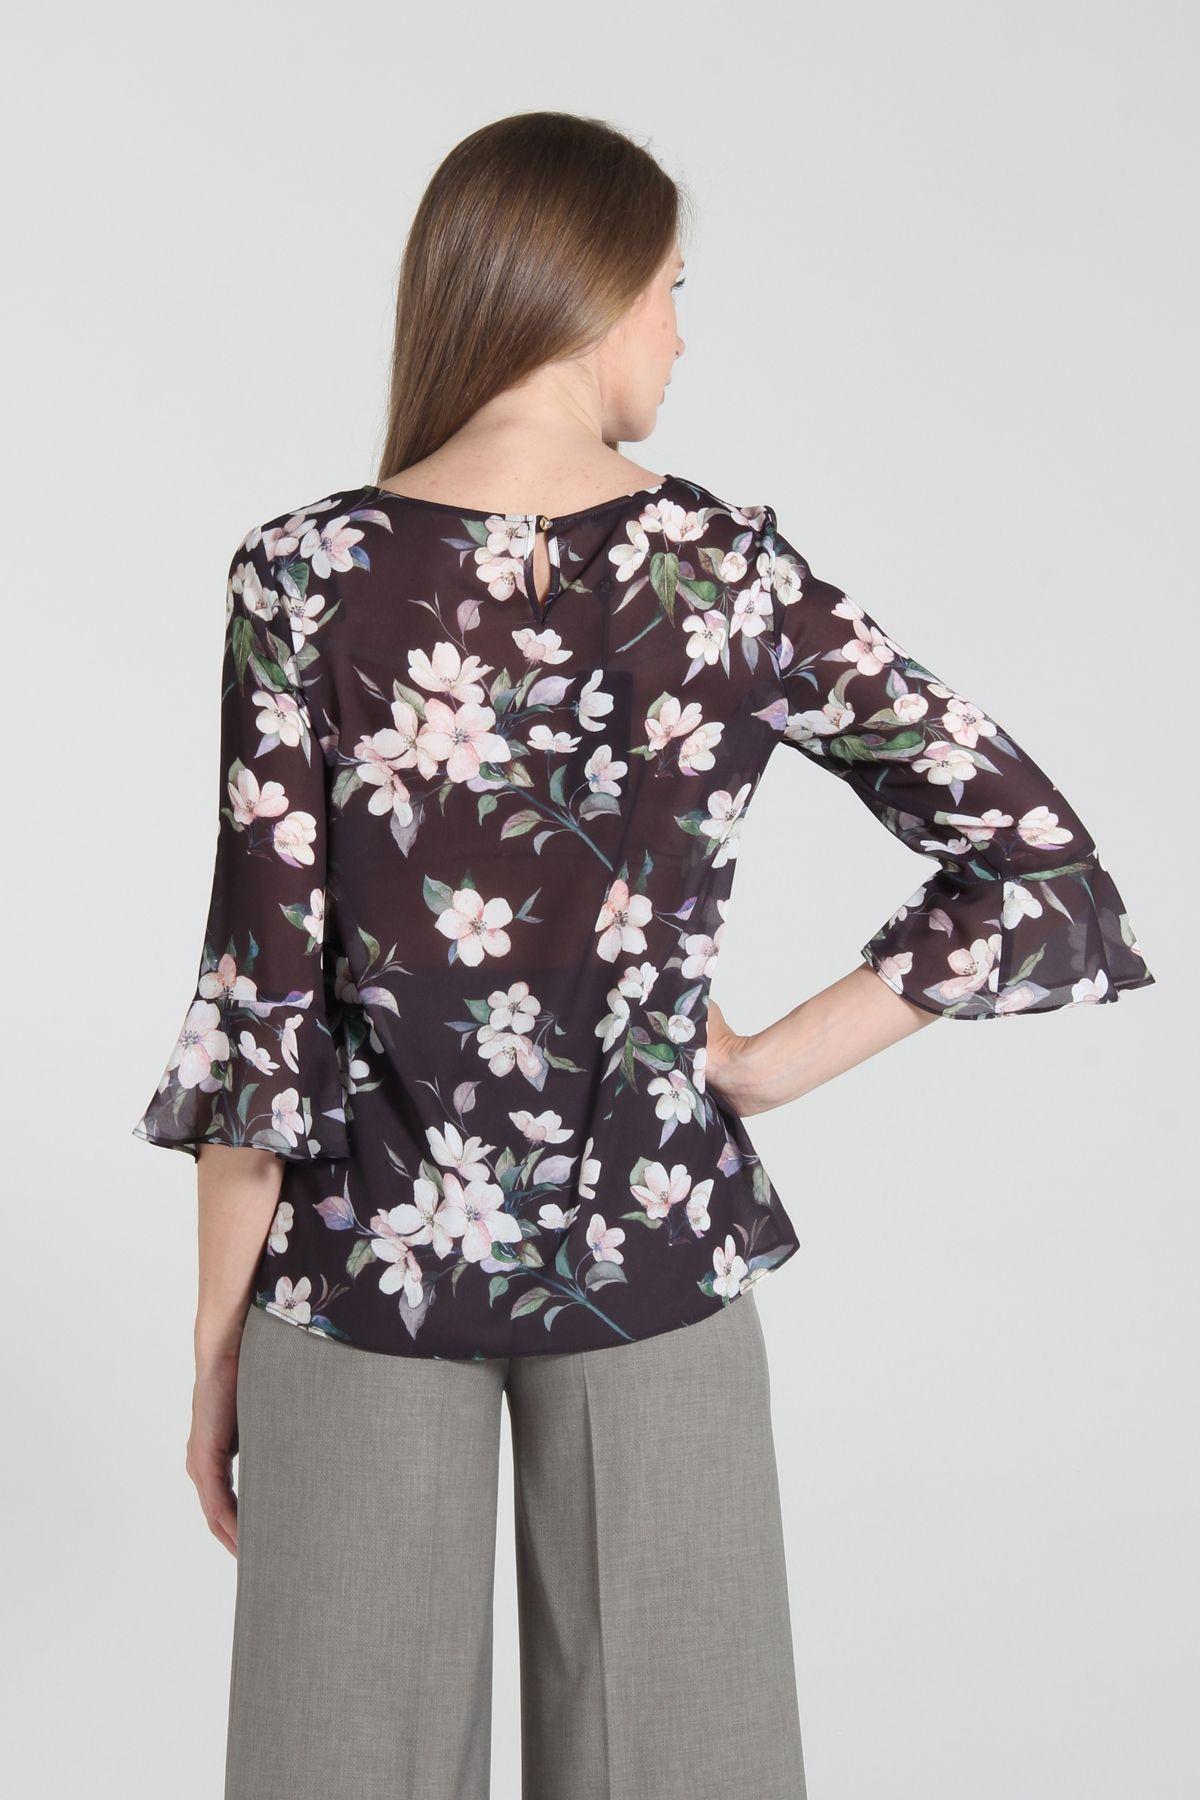 Bluz Ekol Ekol Cicek Desenli Volanli Kol Bluz Bluz Siyah Satin